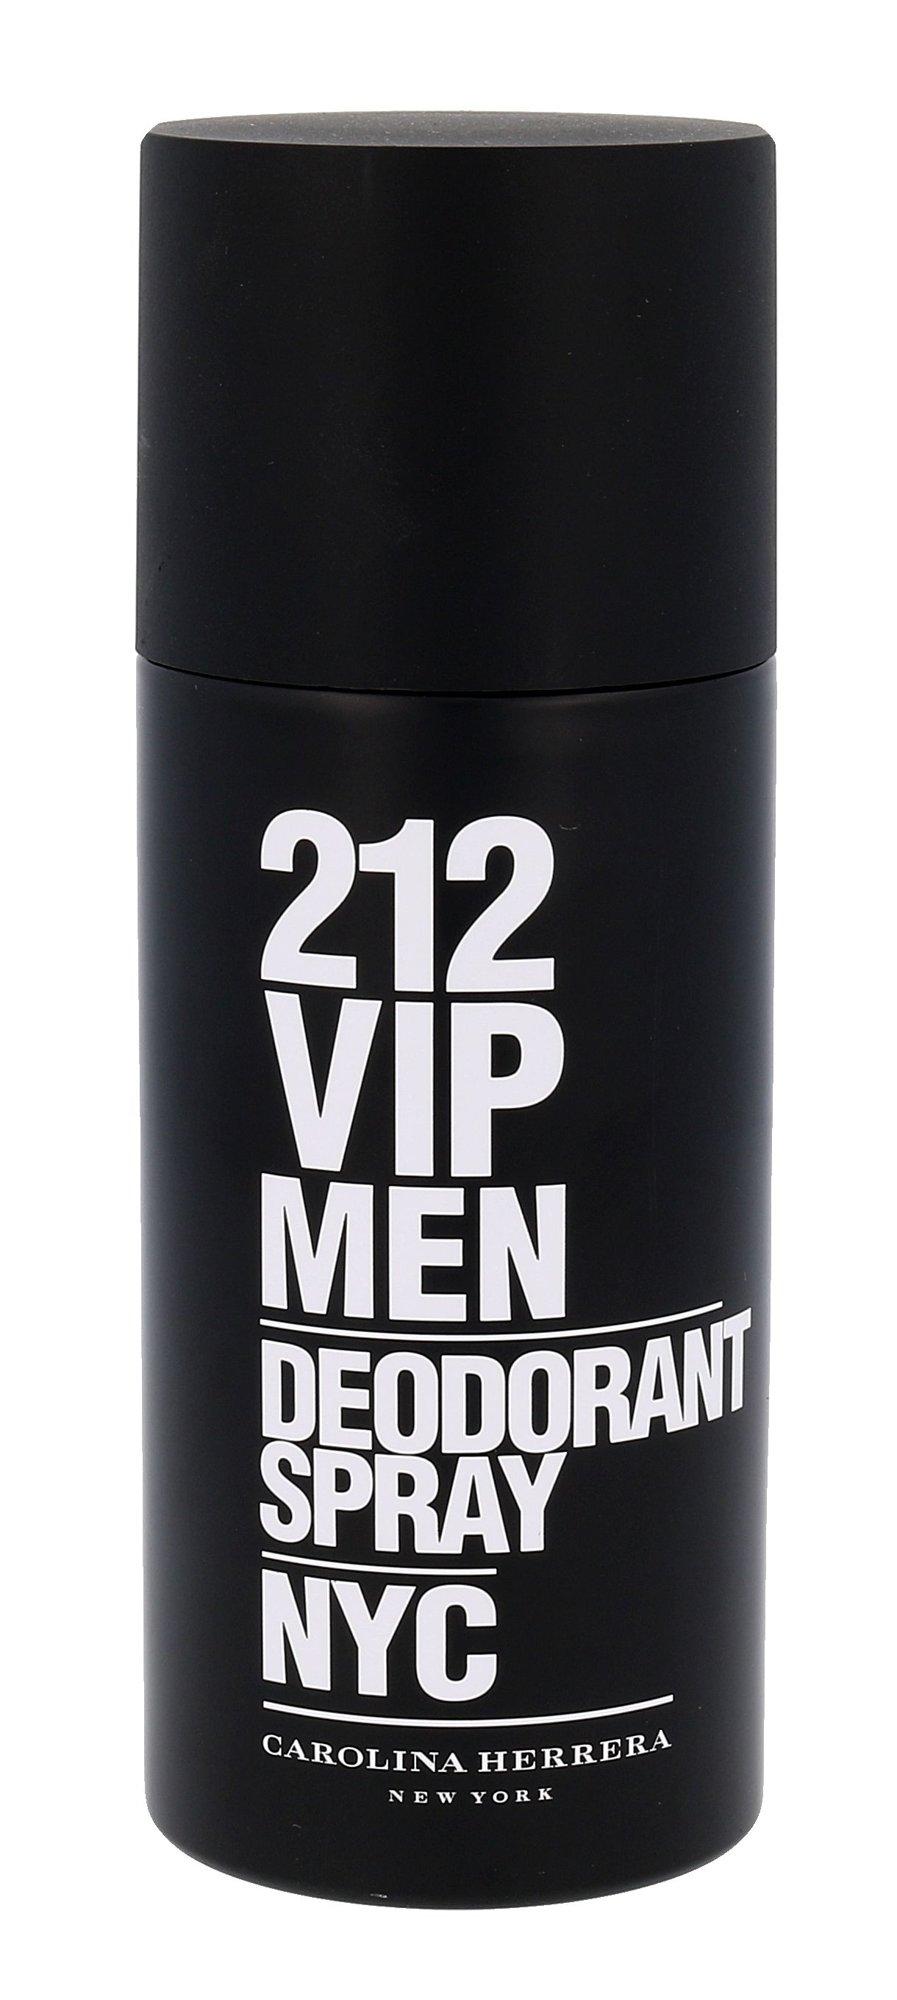 Carolina Herrera 212 VIP Men Deodorant 150ml